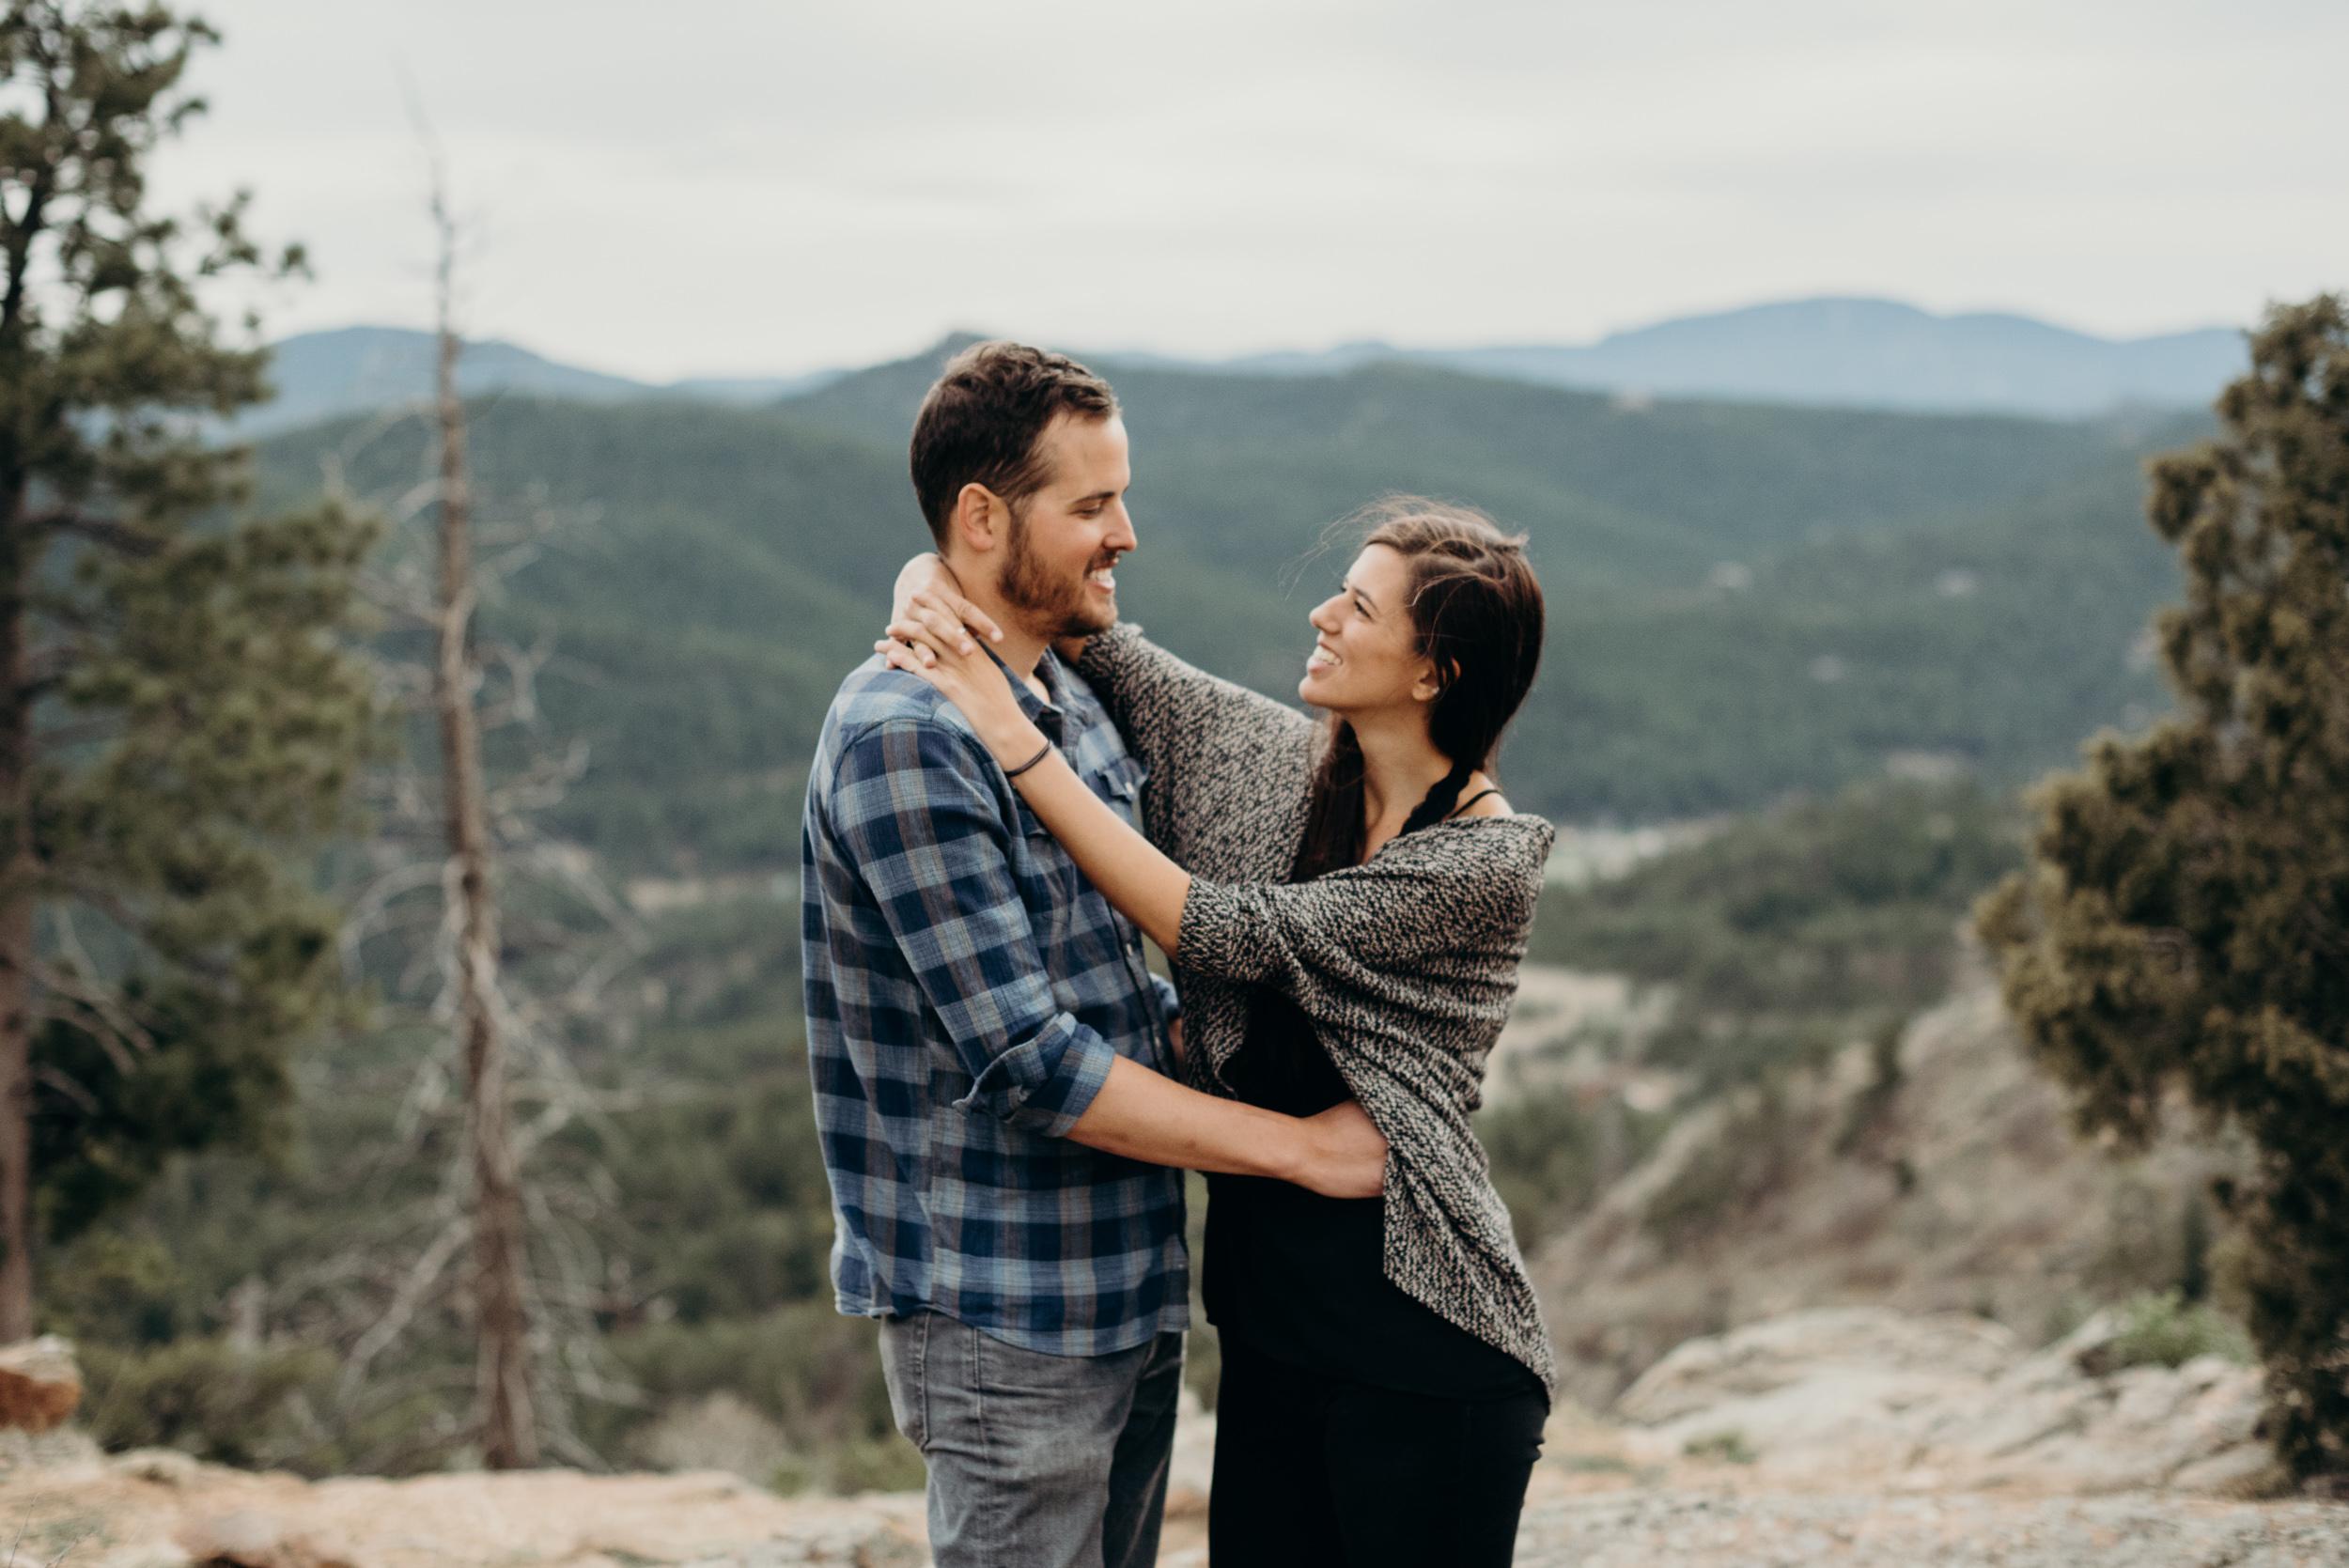 Denver-Colorado-Mt-Falcon-Engagement-Megan-Graham-Photography-7020.jpg